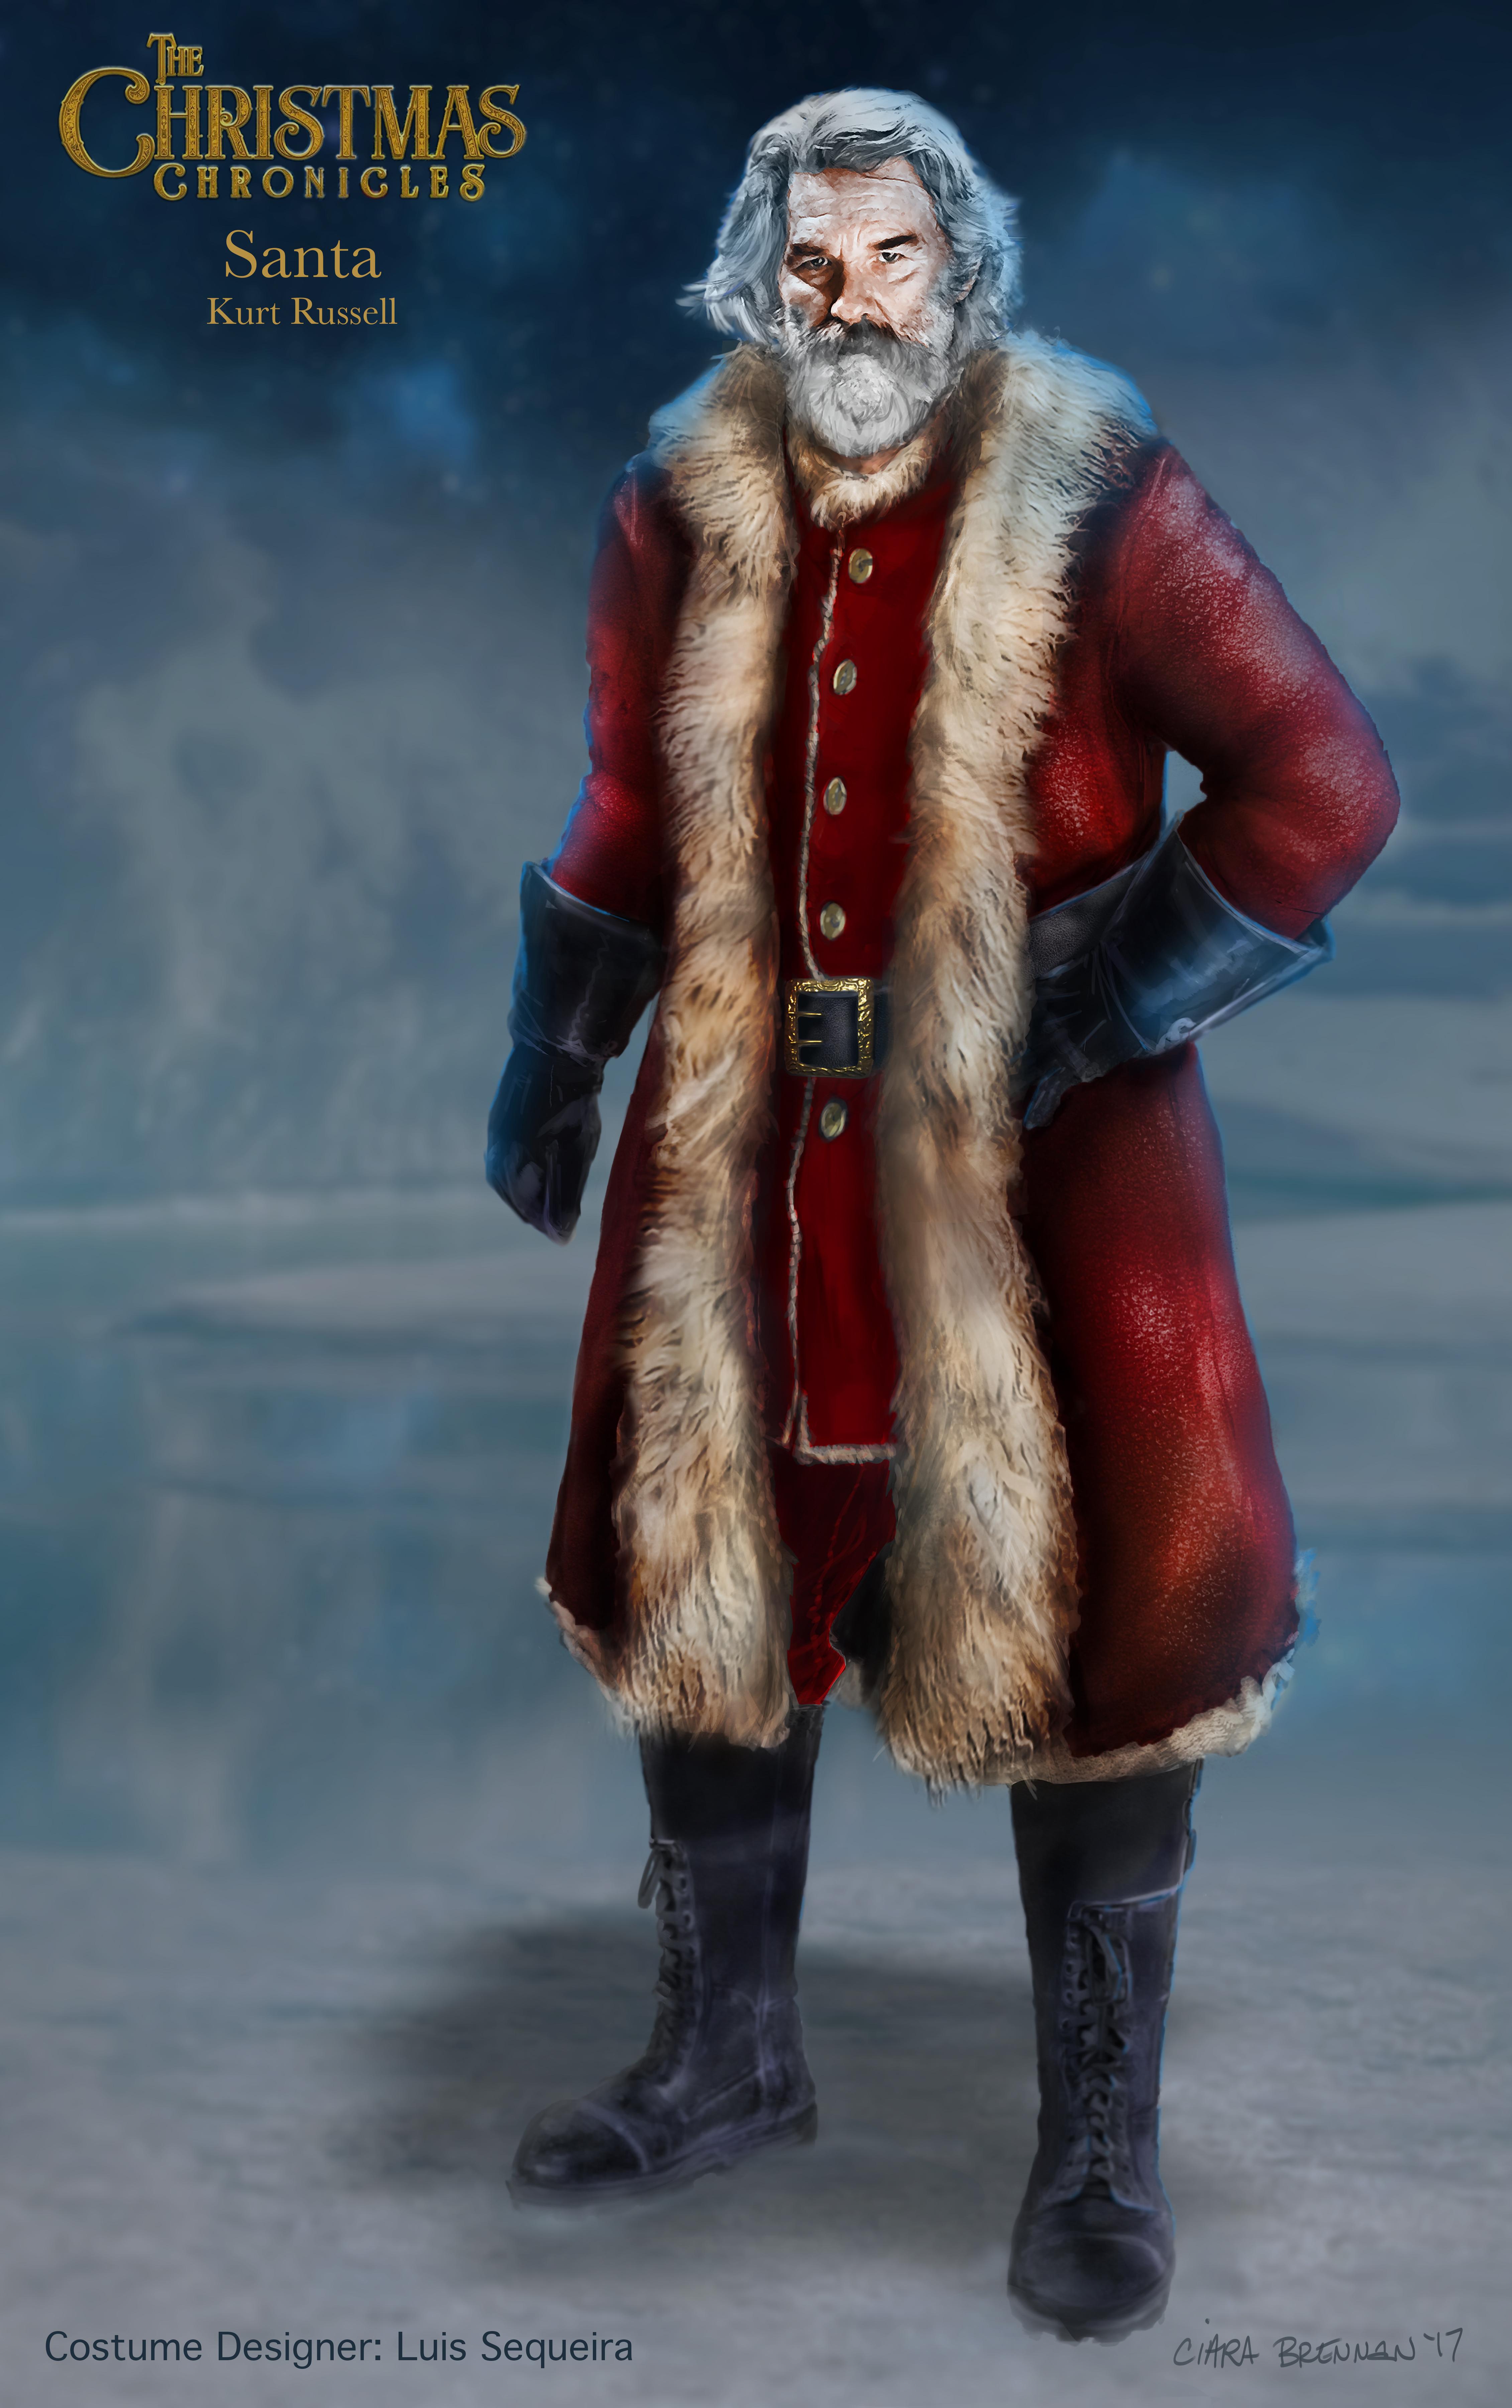 The Christmas Chronicles Santa.The Christmas Chronicles 2018 Photo Gallery Imdb